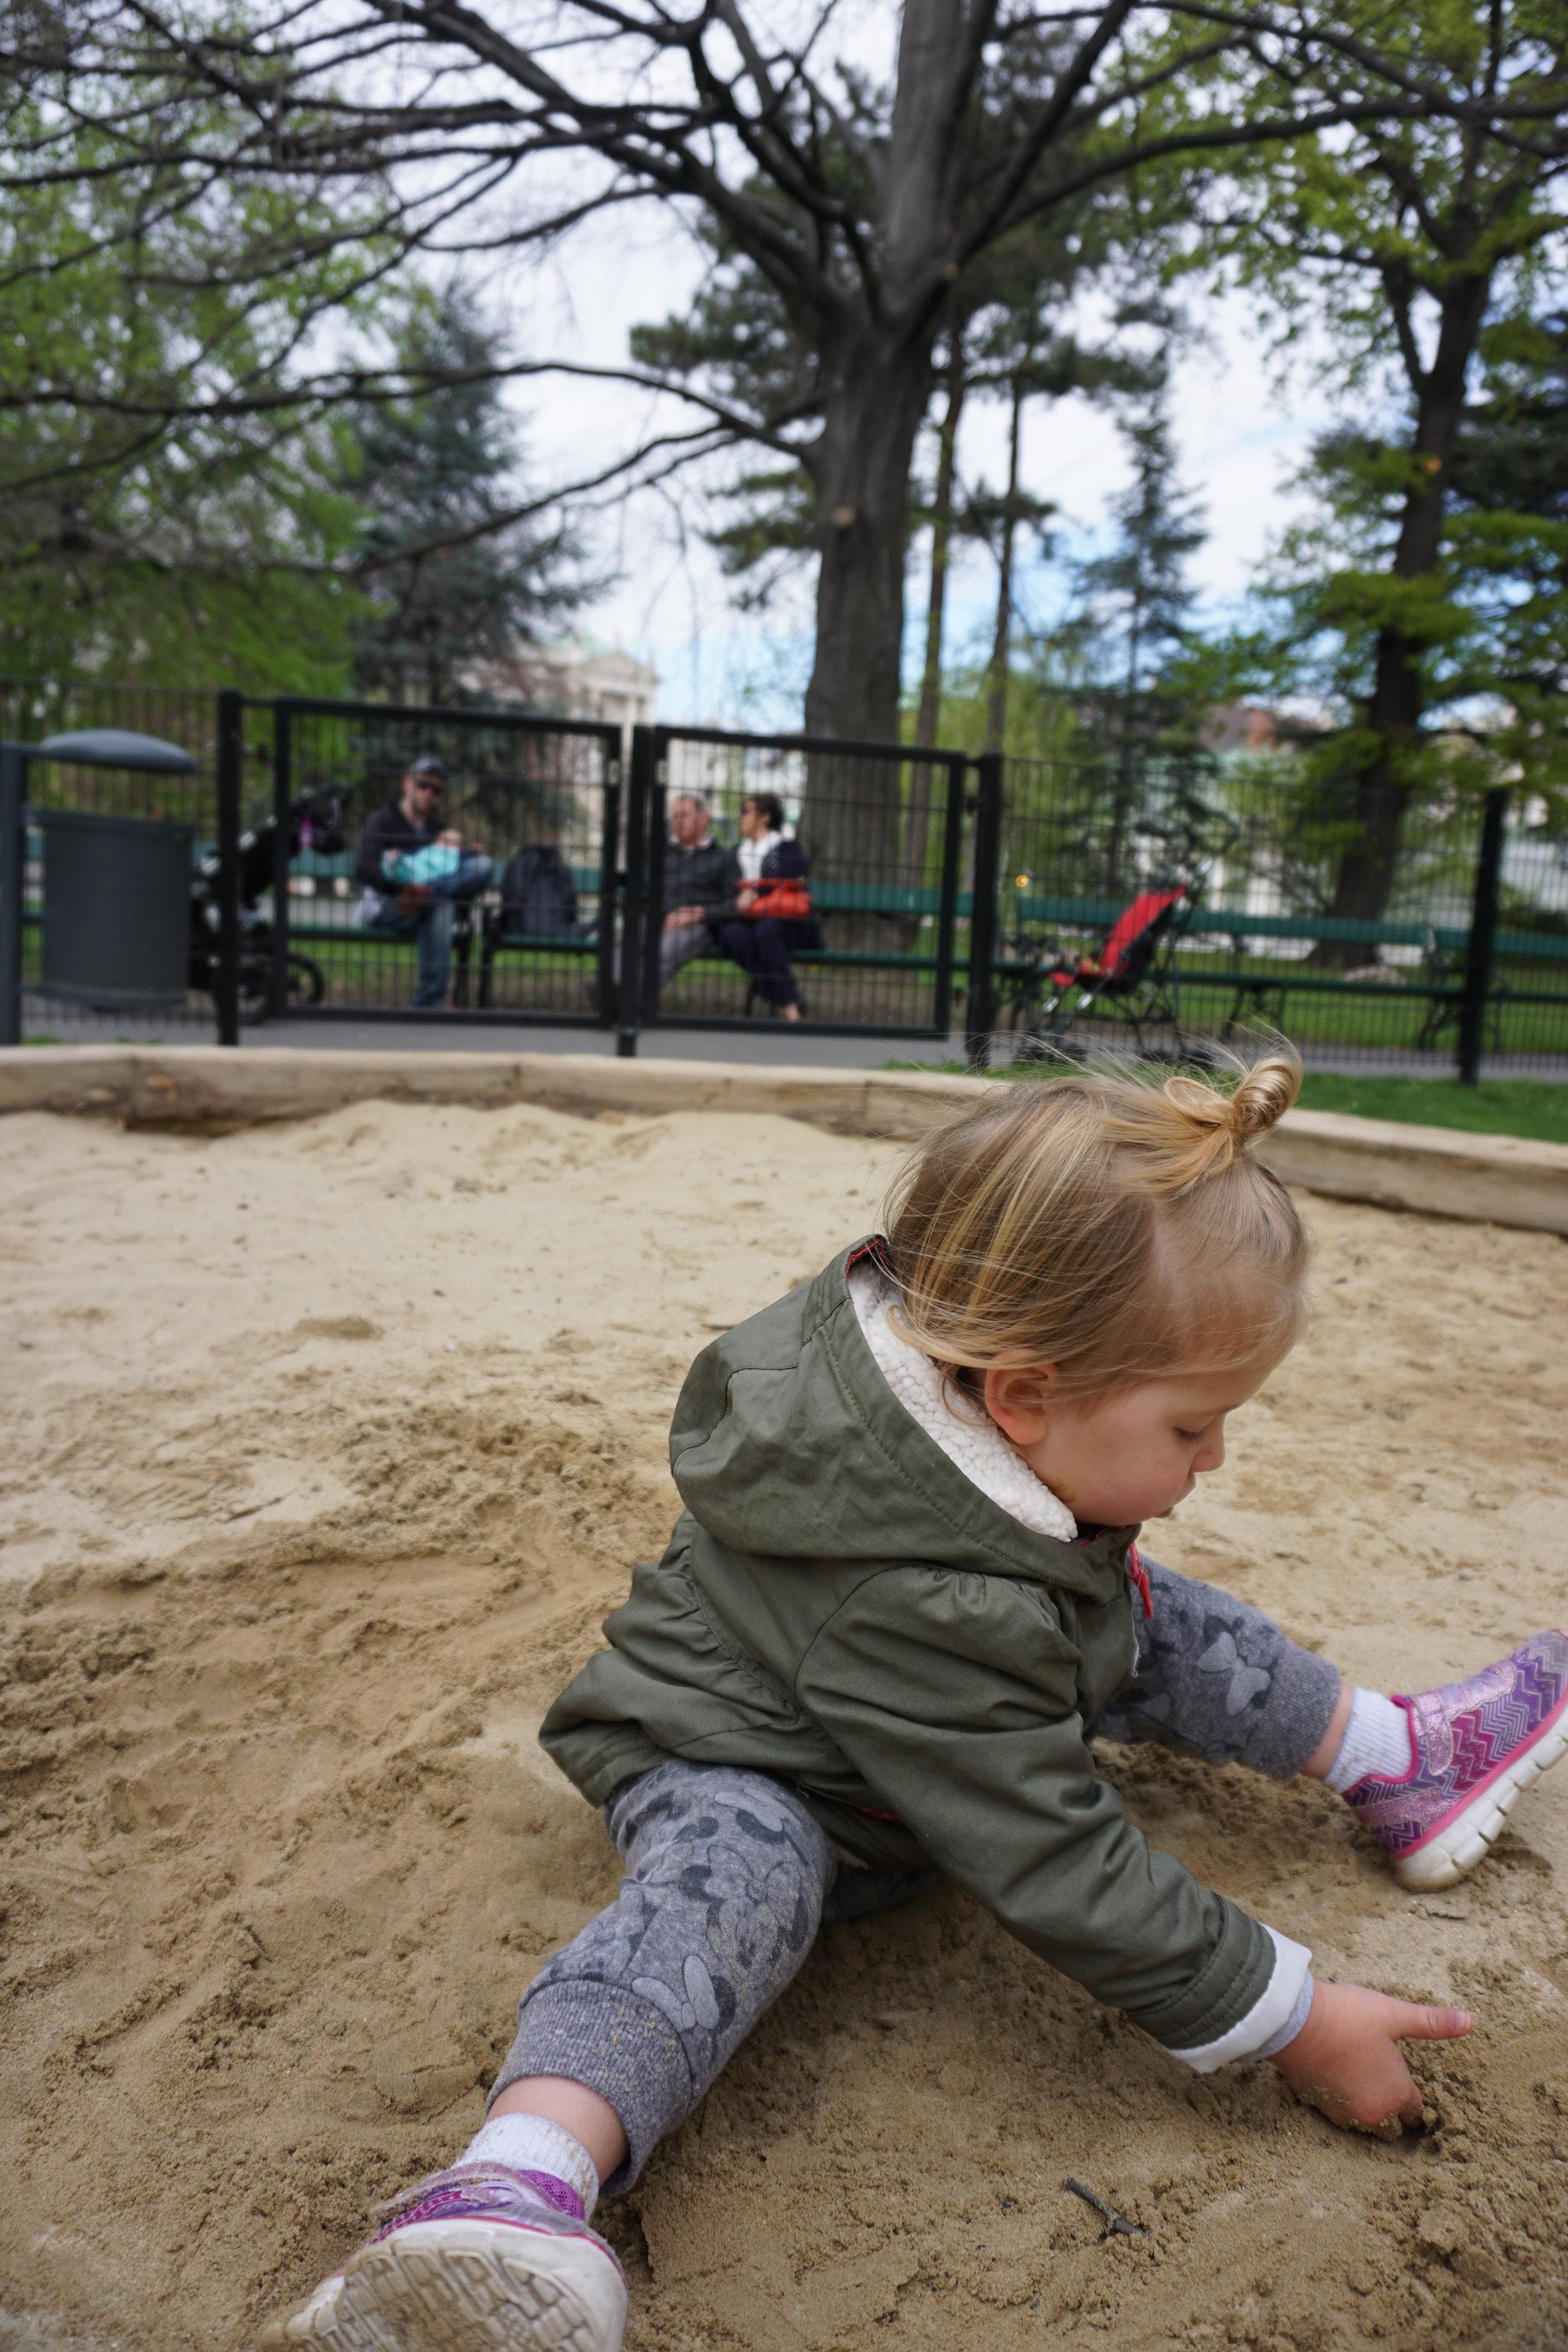 CHarletta playing the kids sandbox at hofburg palace